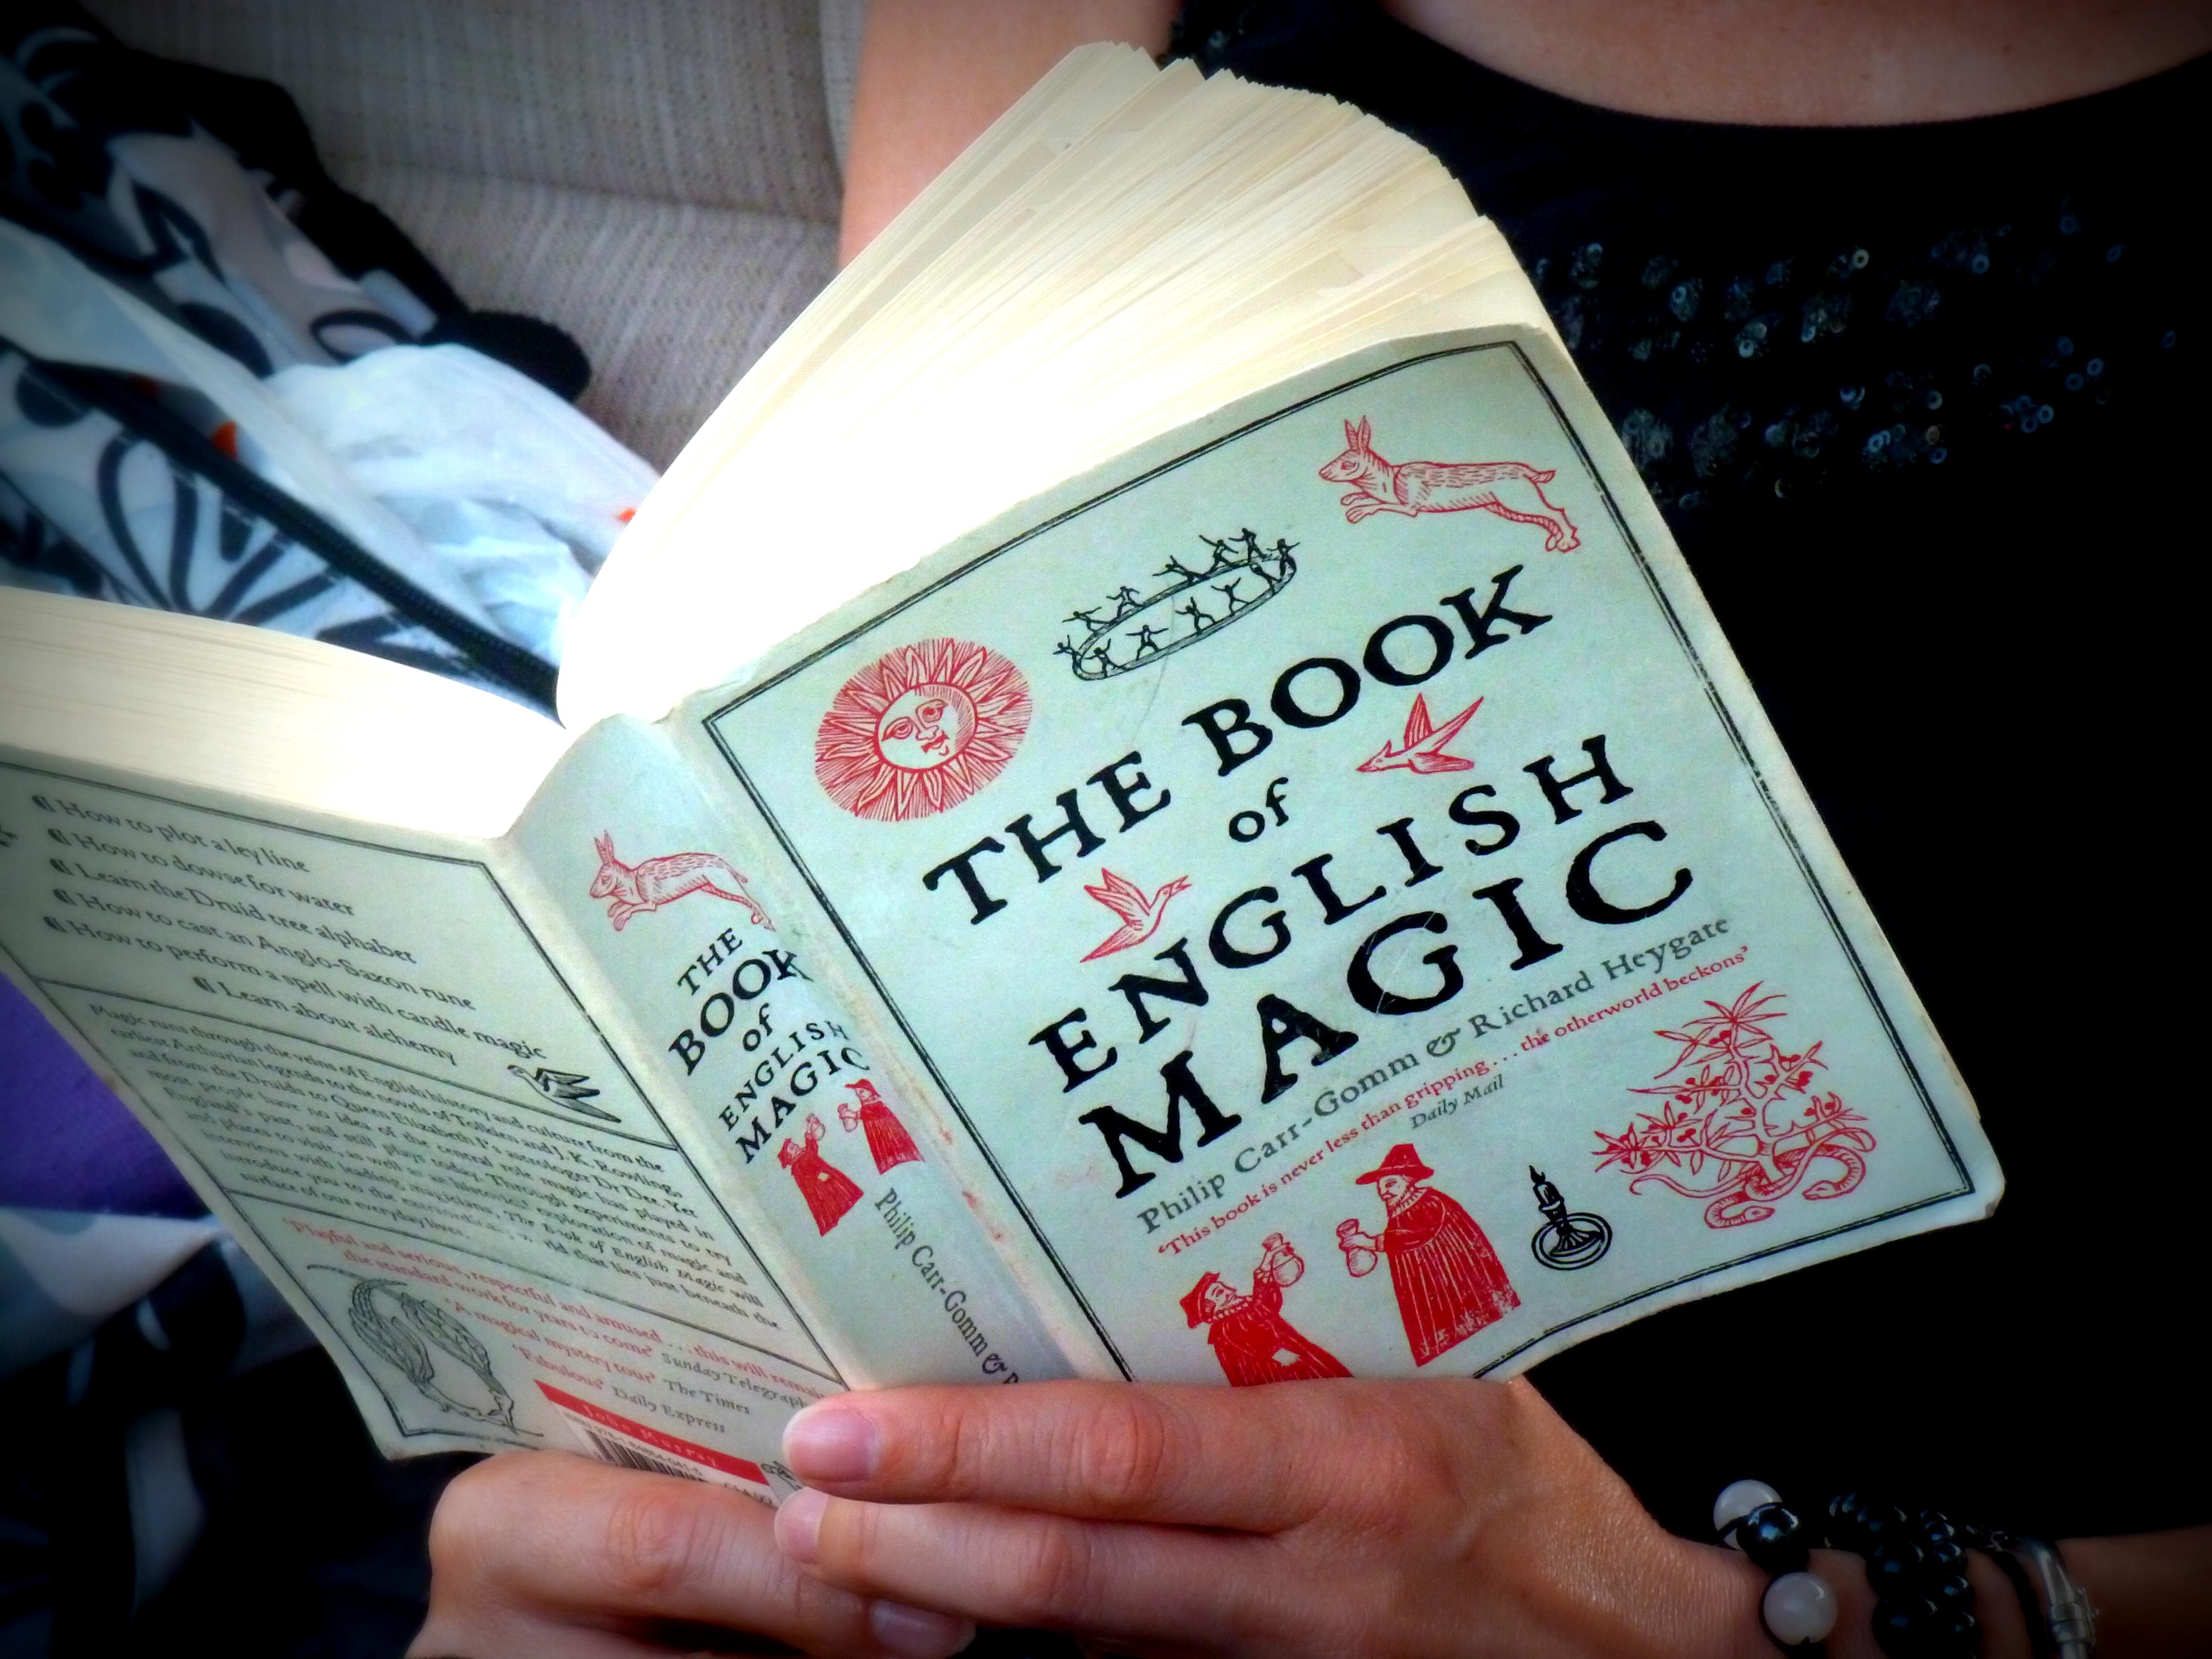 RAPIDEX ENGLISH SPEAKING COURSE BOOK PDF …